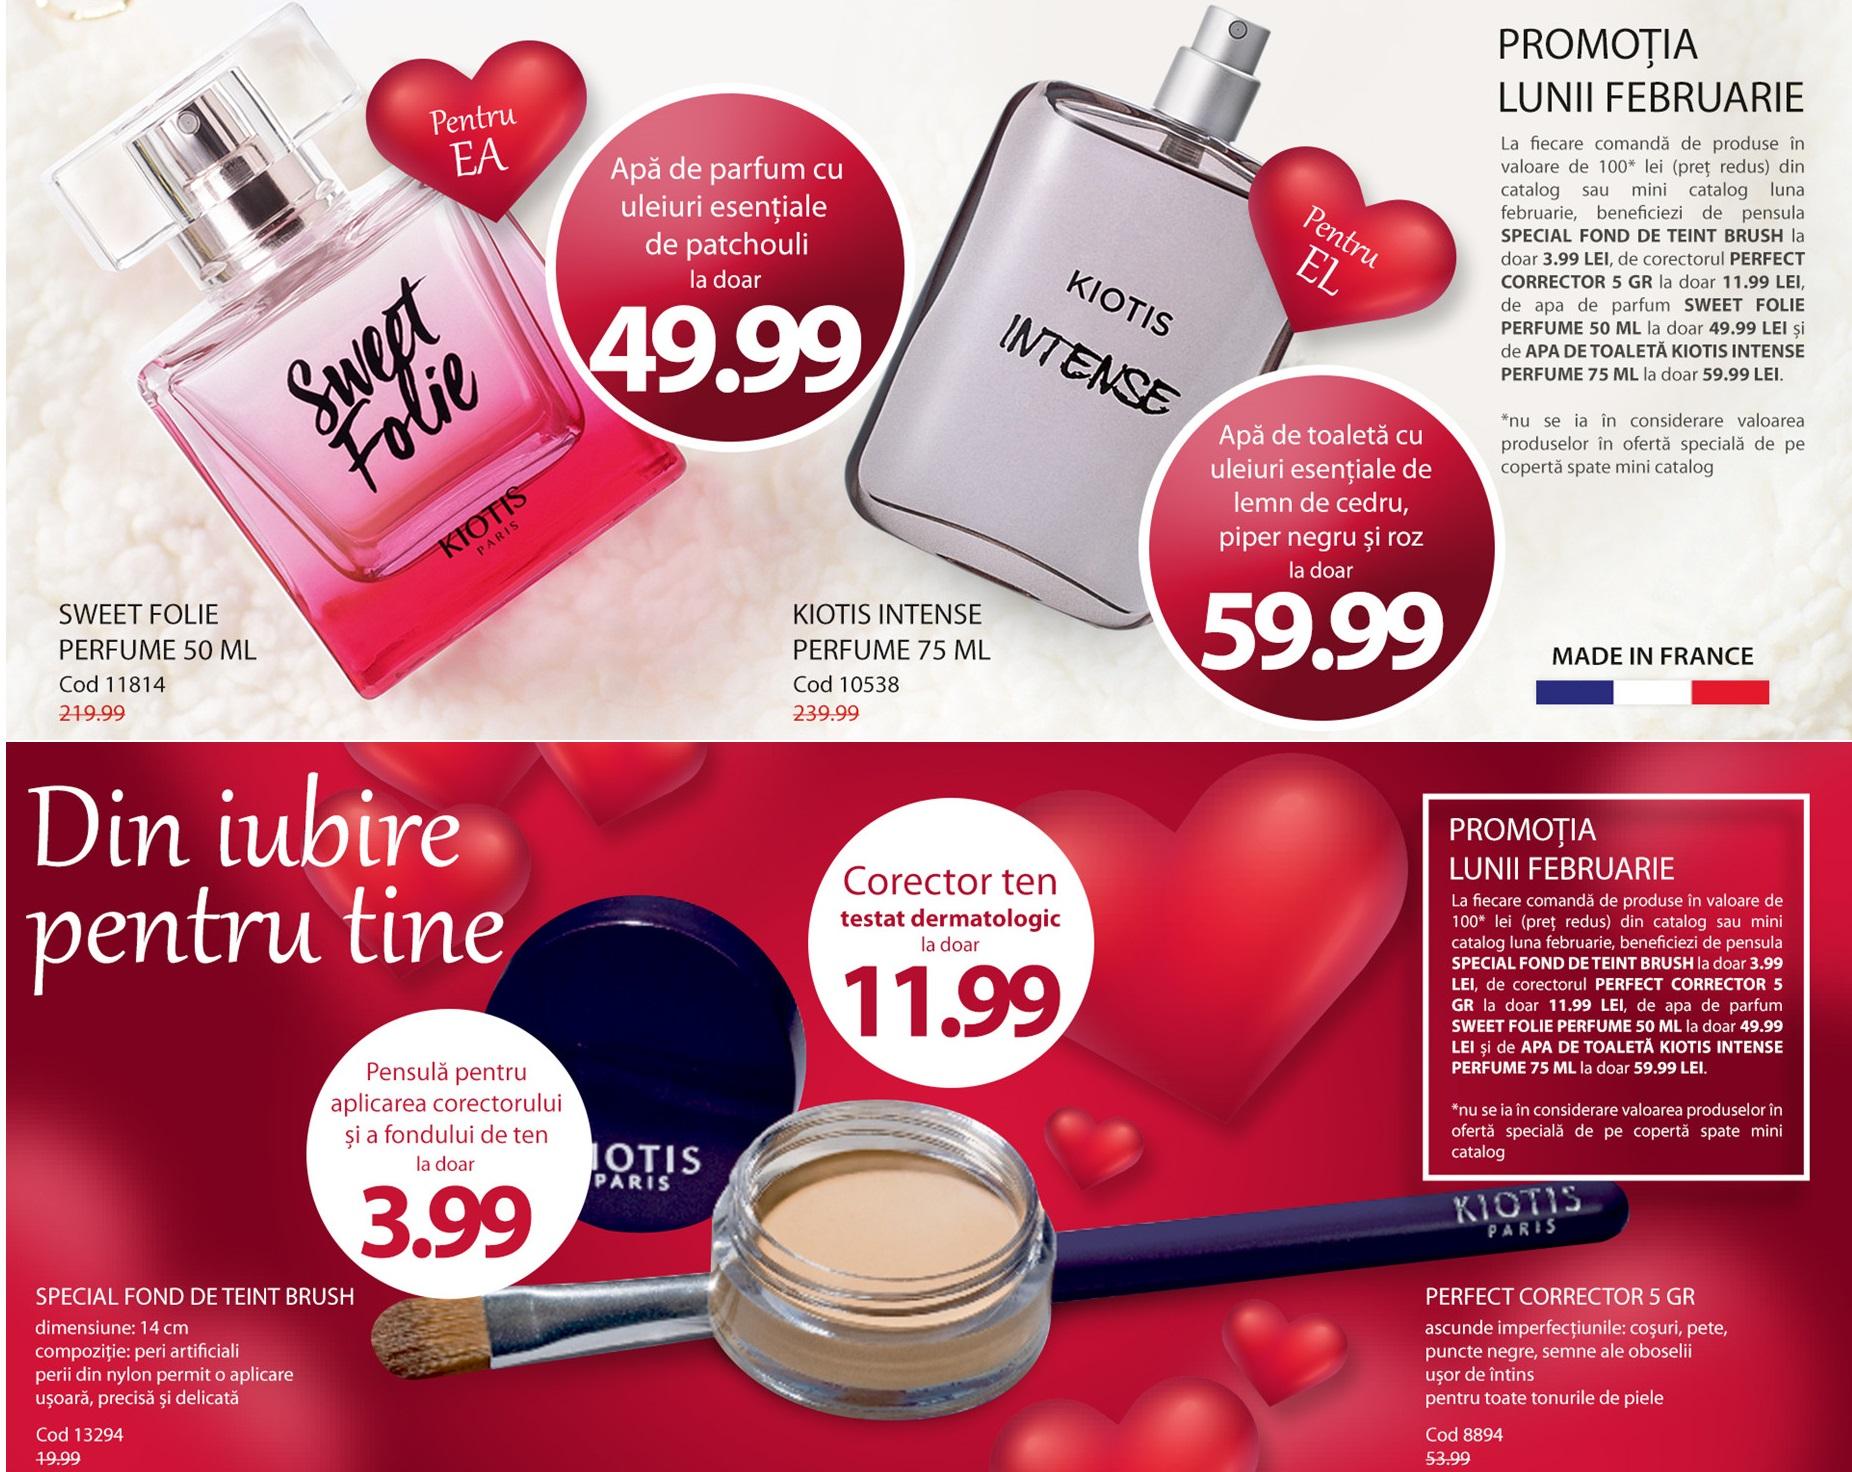 promo mini catalog